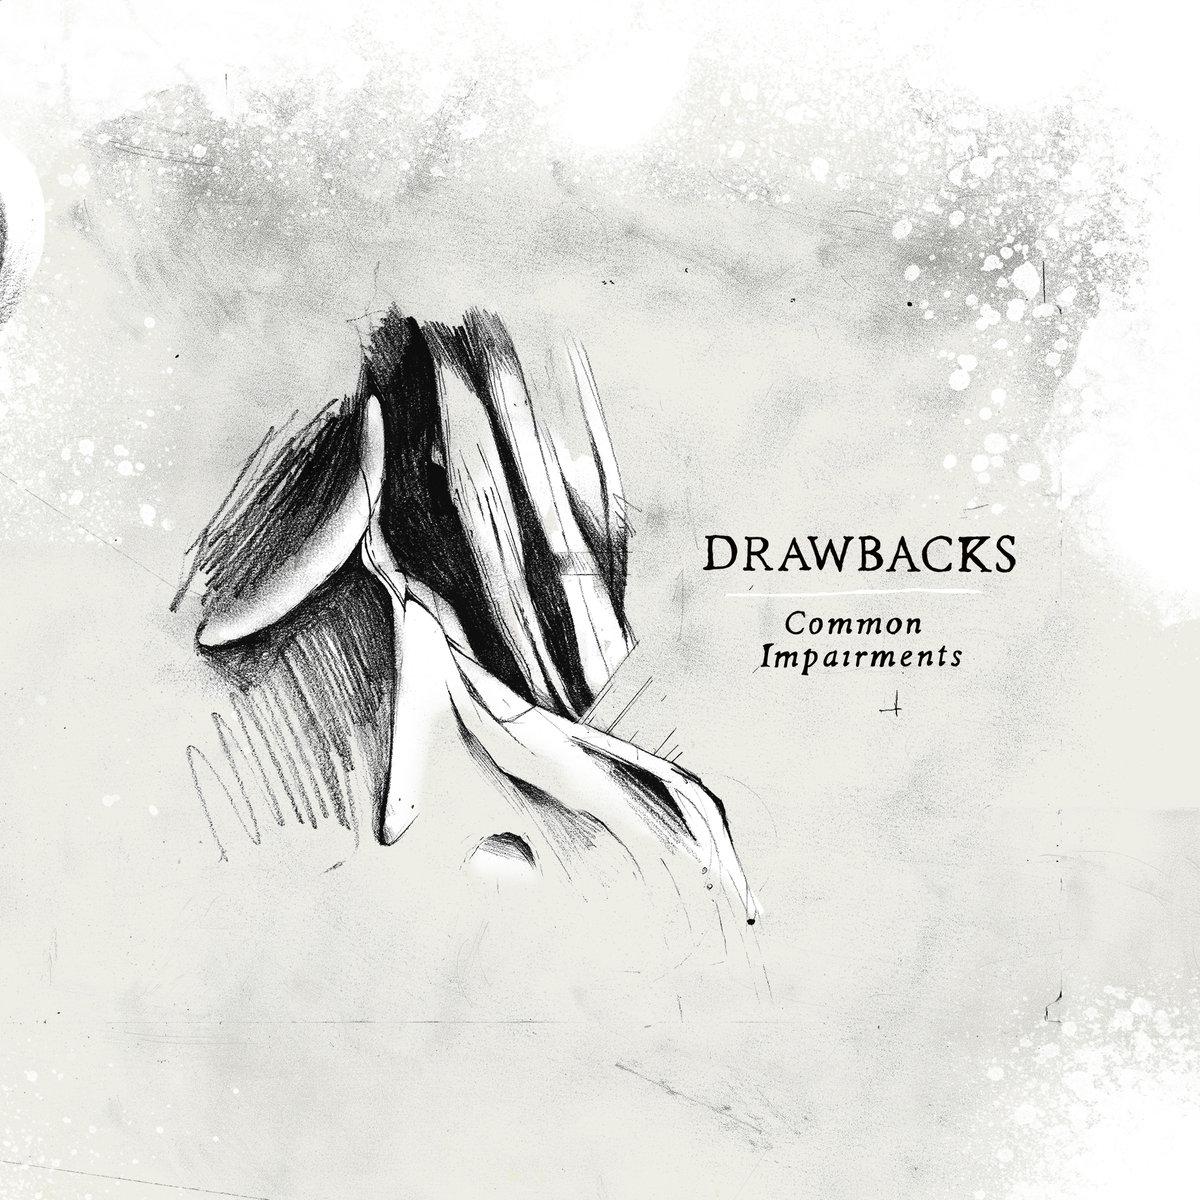 Drawbacks - Common Impairments